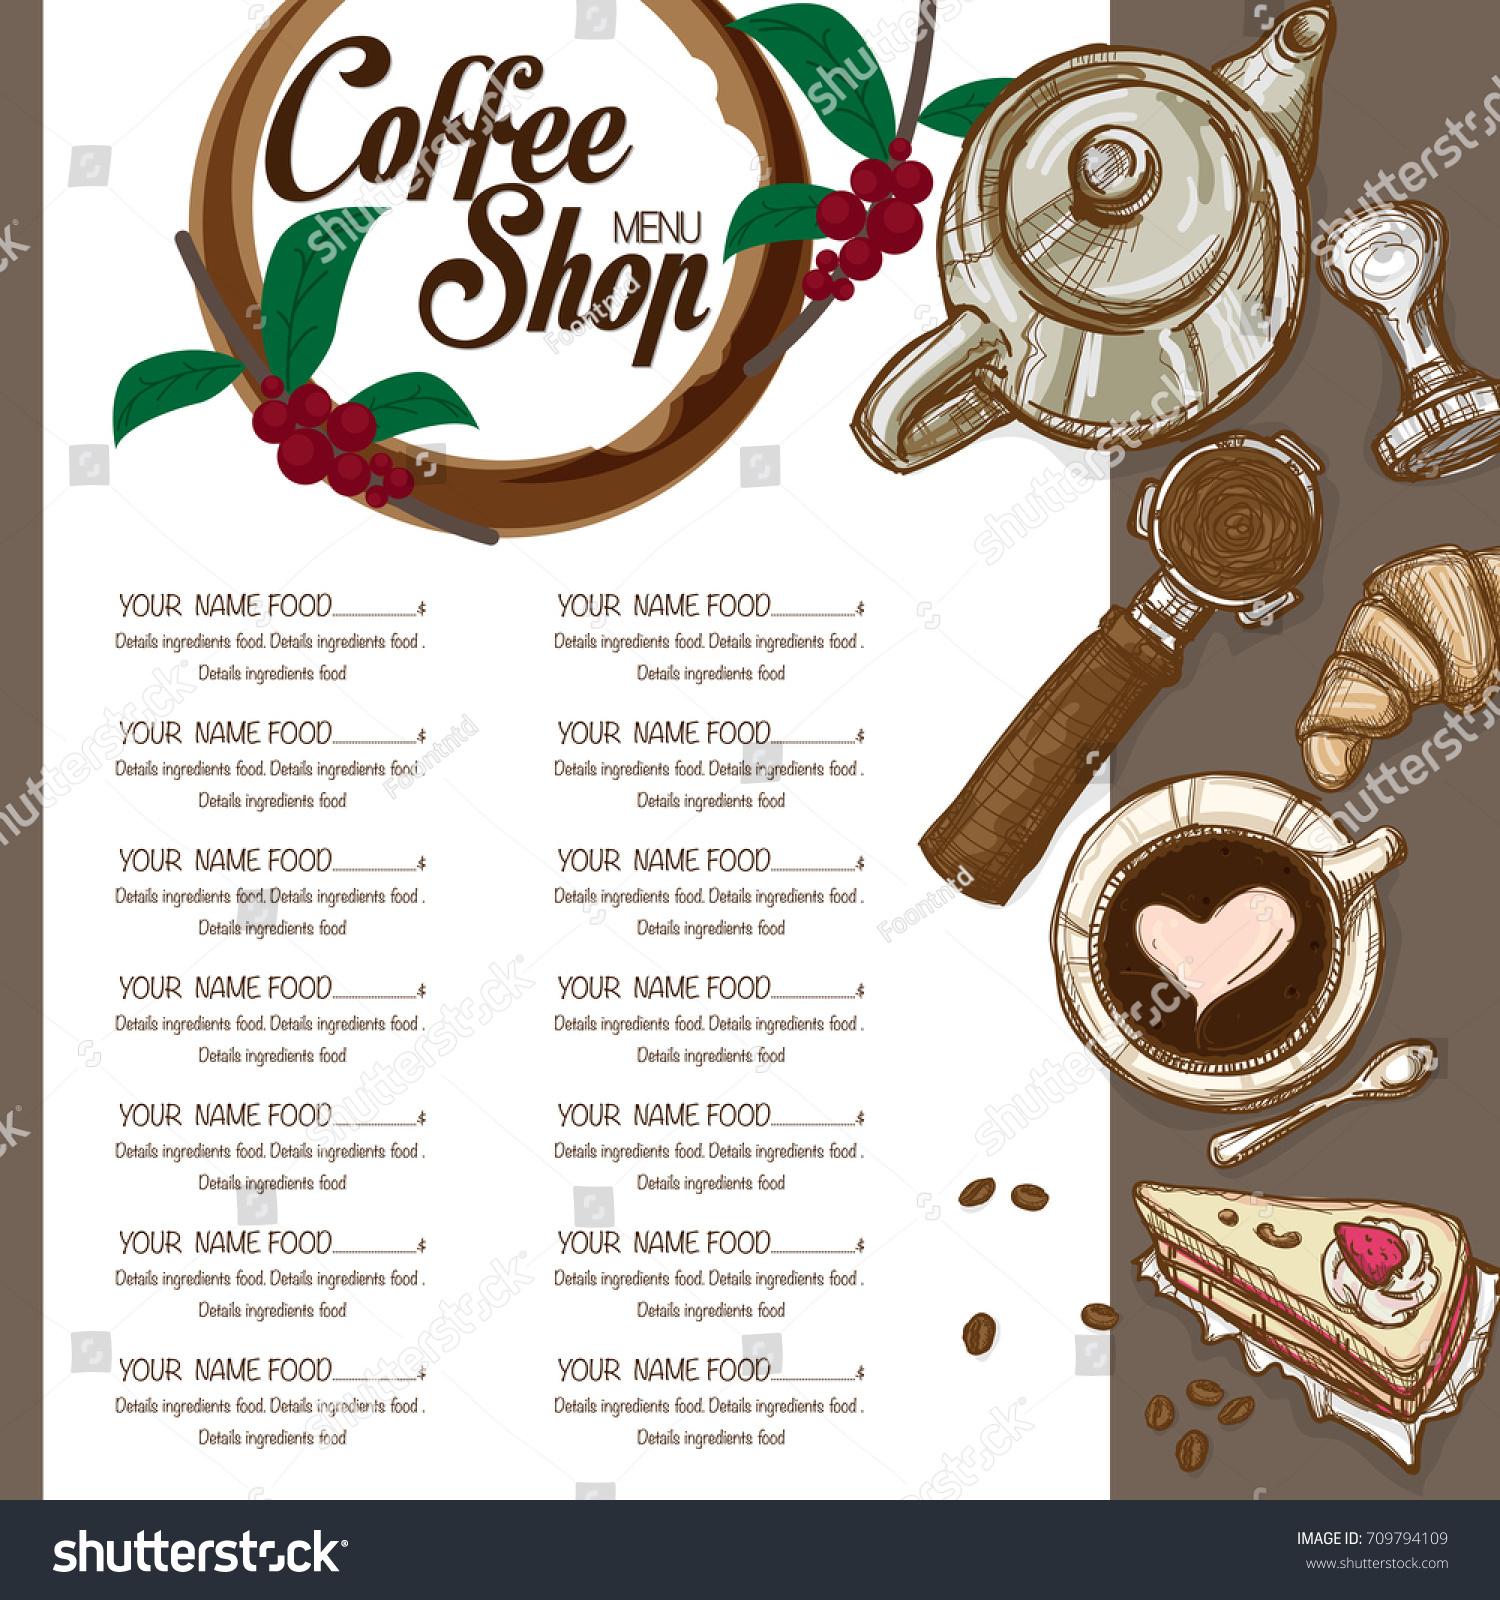 Menu Coffee Shop Restaurant Template Design Stock Vector Royalty